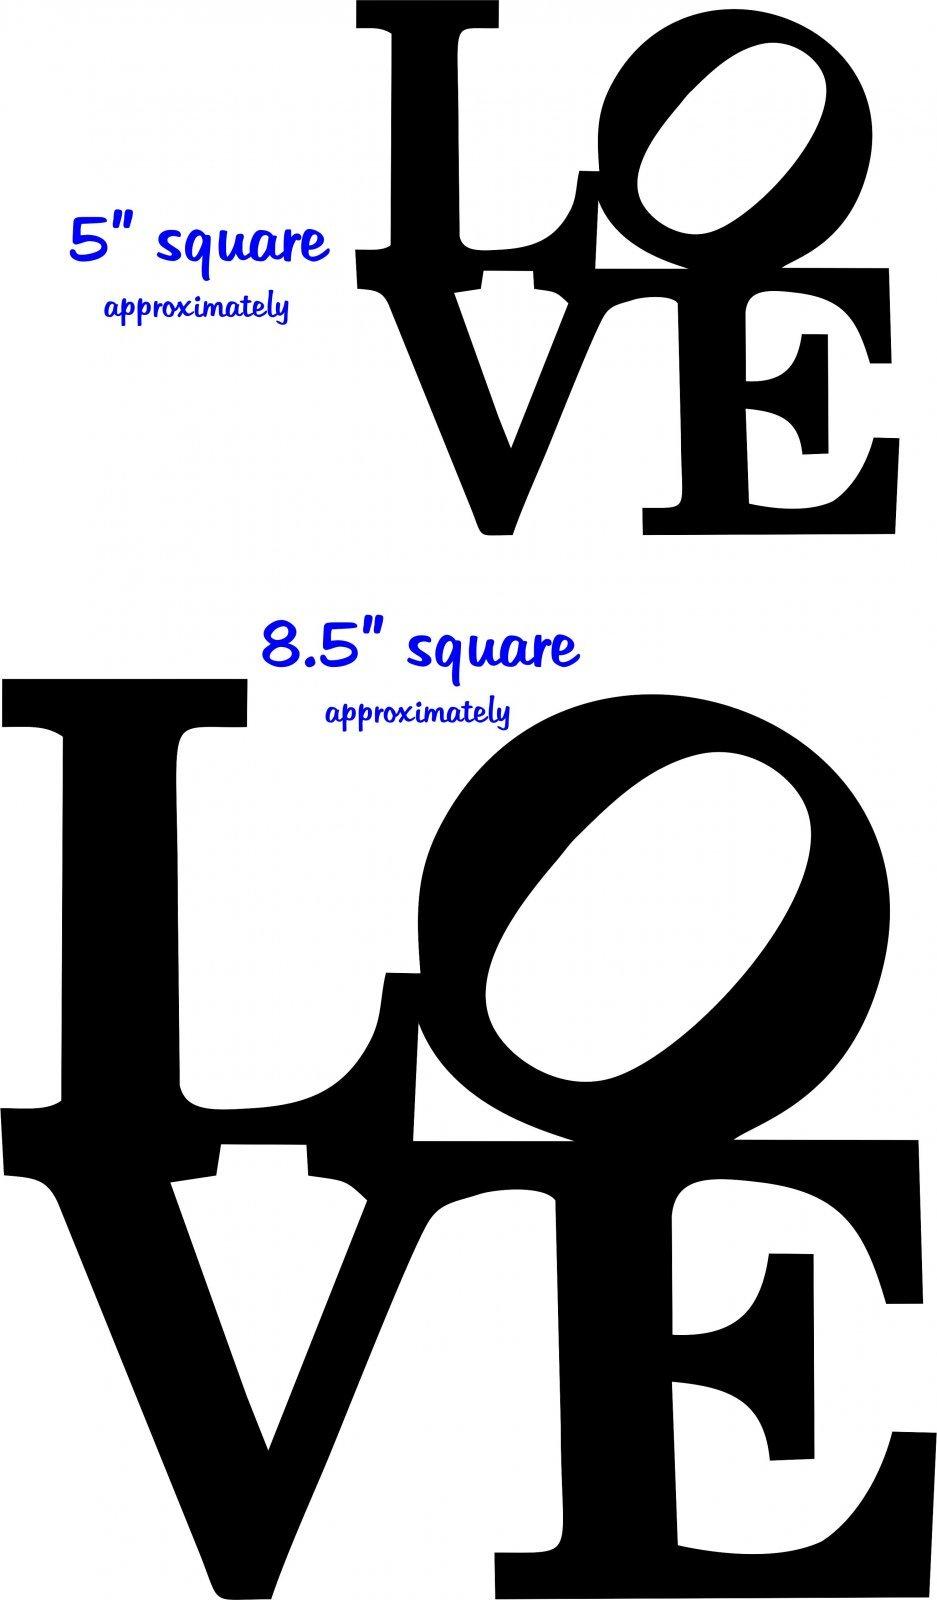 Big Love Laser Cut 9x9